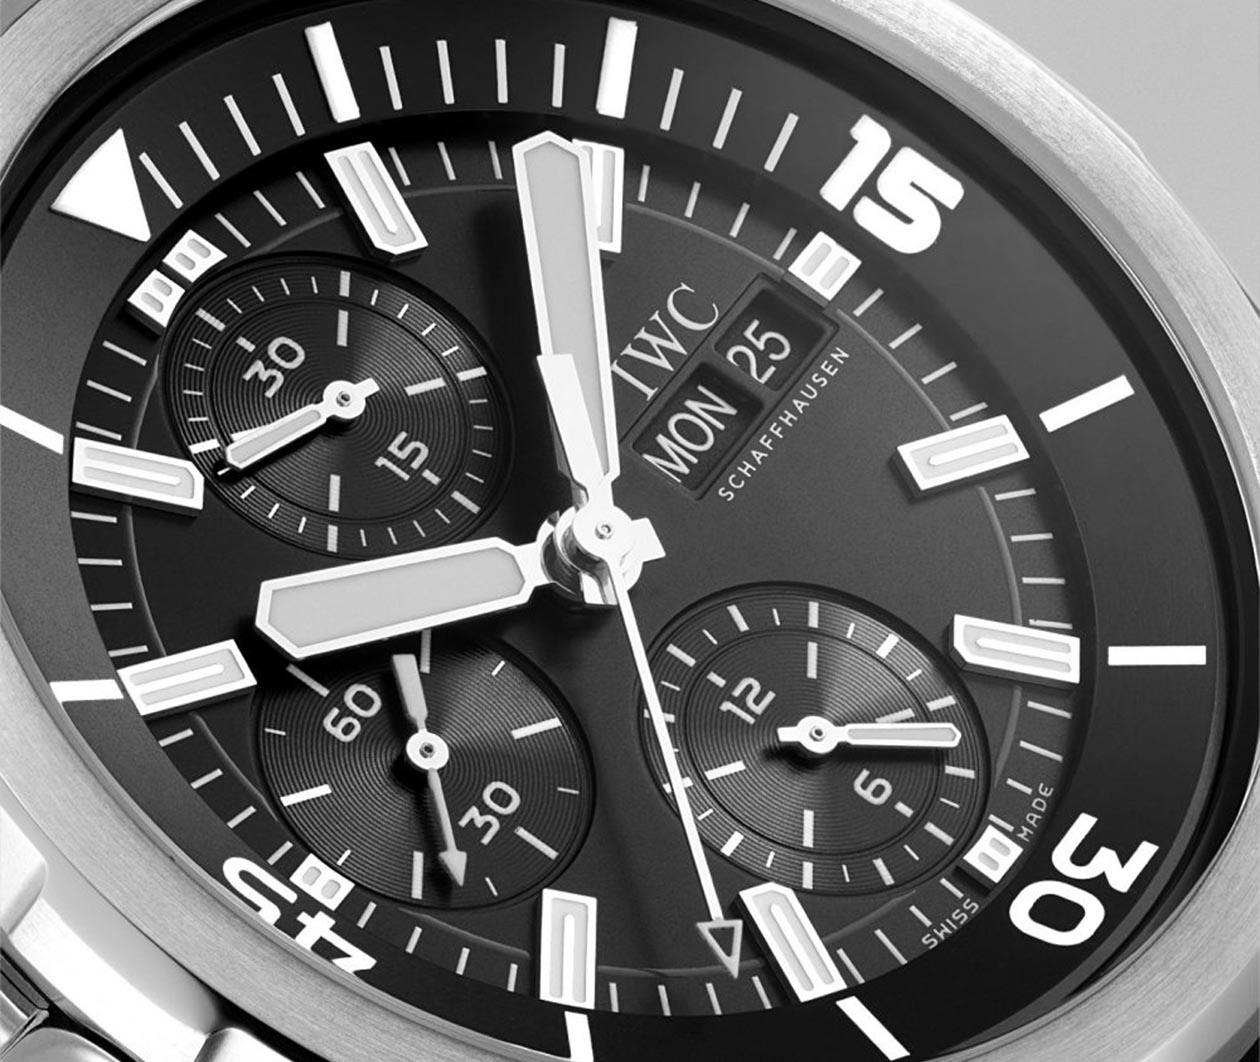 IWC Aquatimer Chronograph IW376803 Carousel 4 FINAL